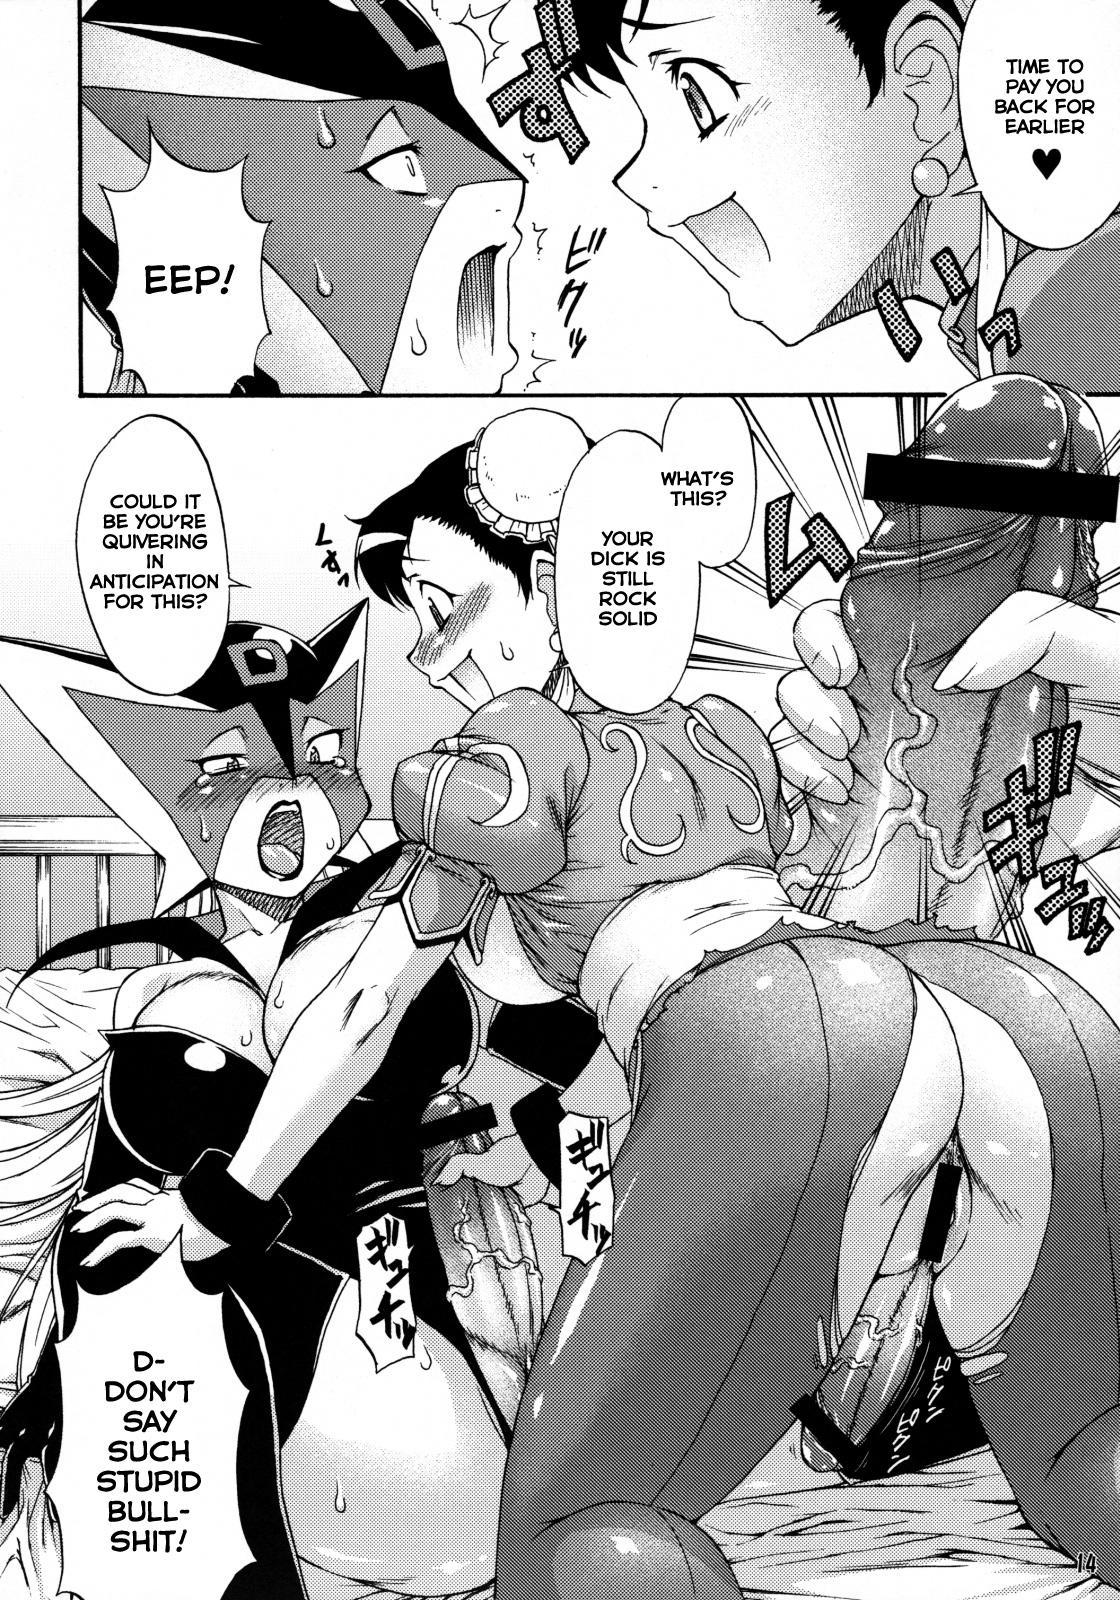 Mikawa Ondo 6 12